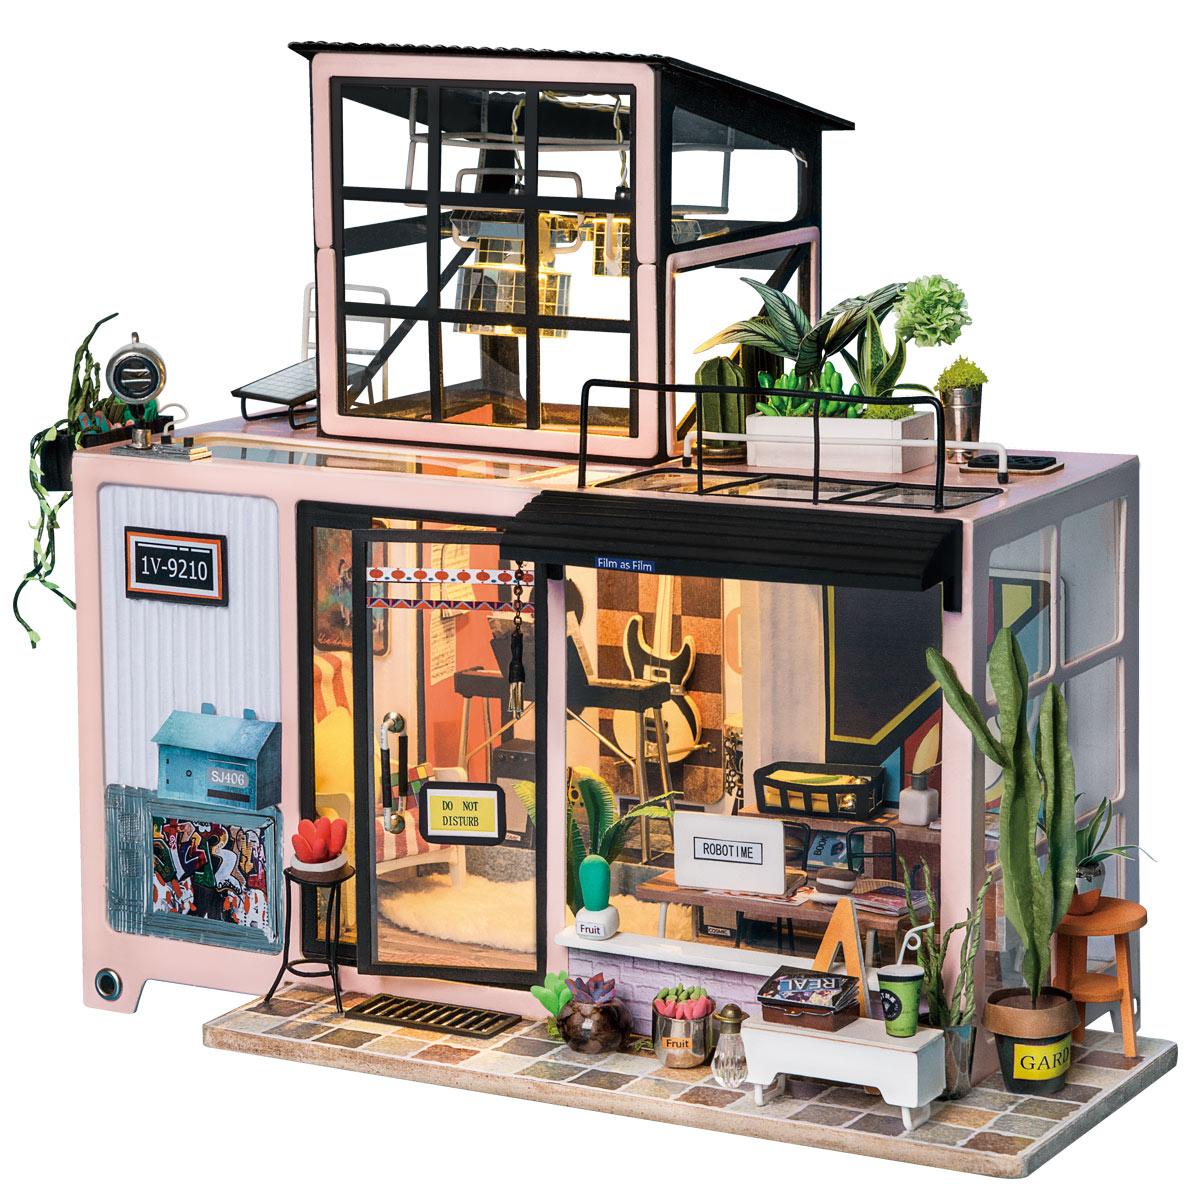 Kevin's Studio DG13